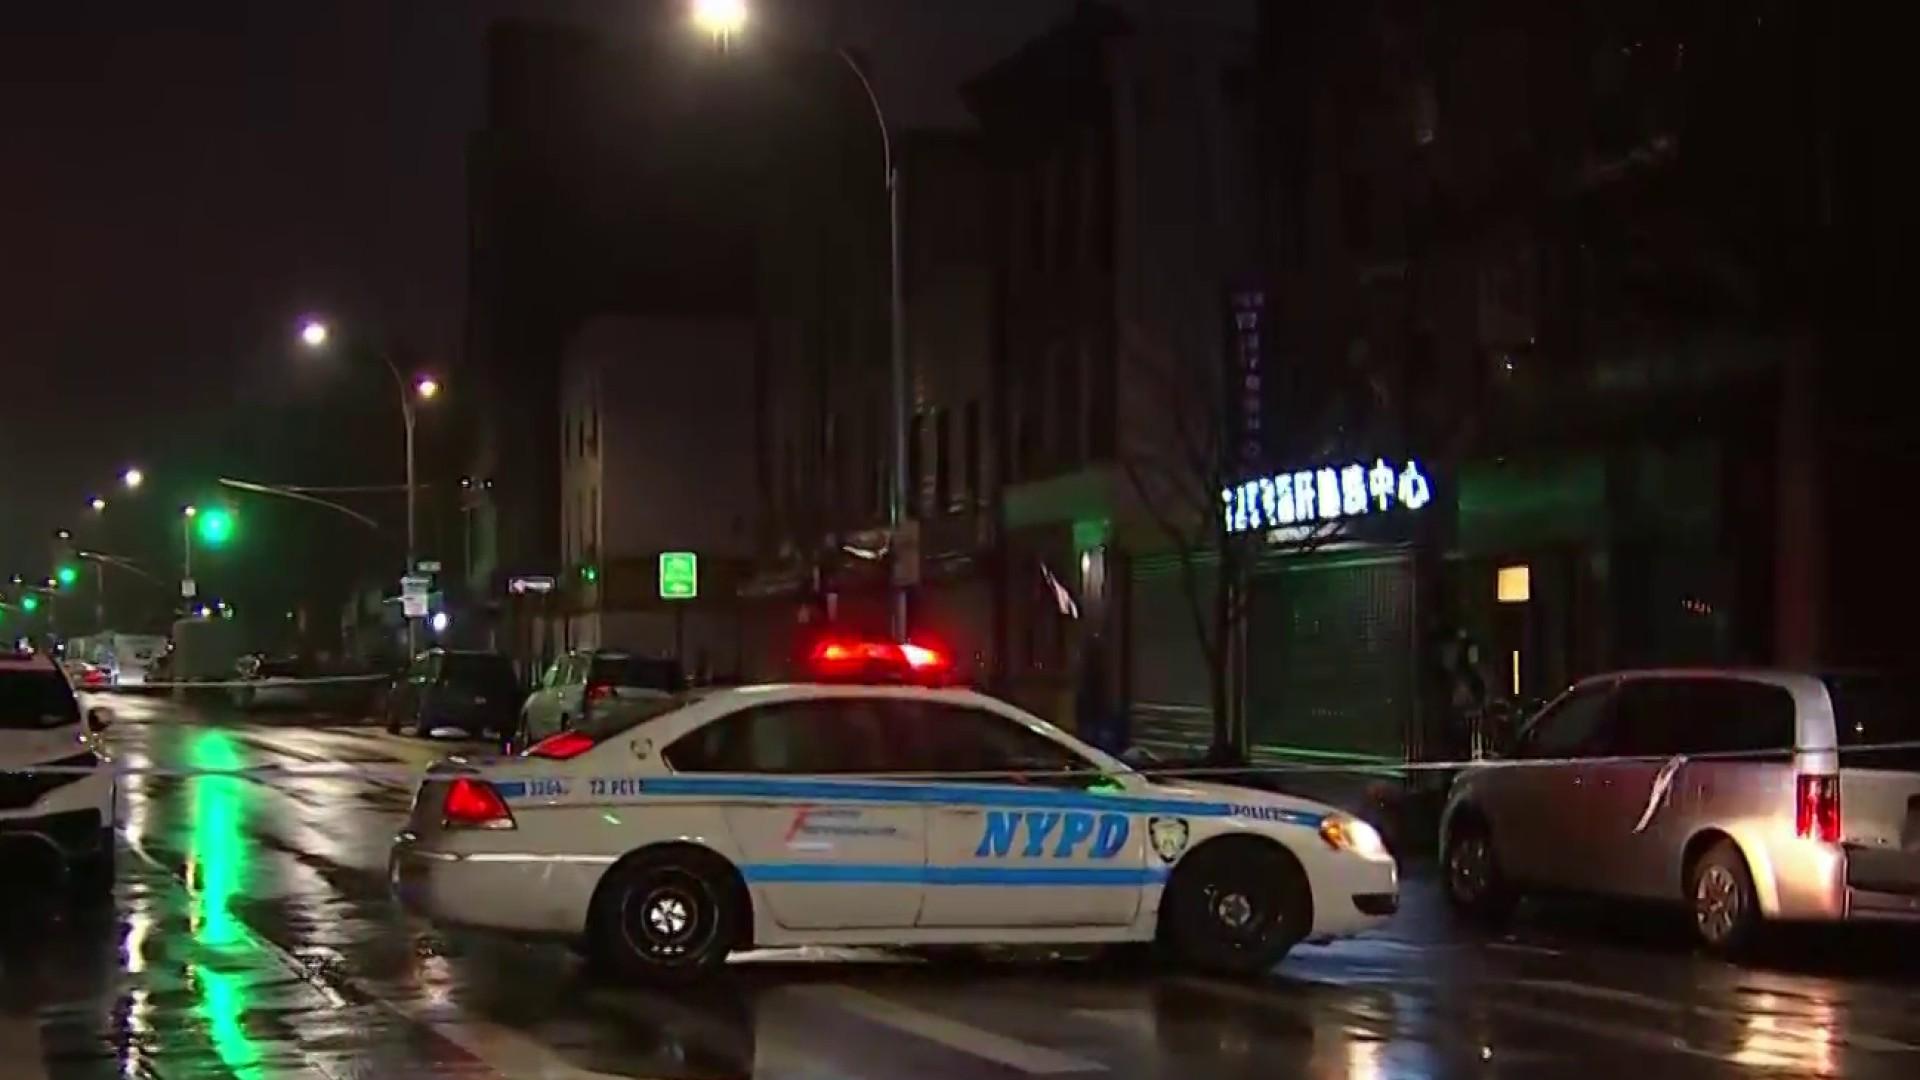 NYPD Arrests Suspect Who Killed Good Samaritan, Stabbed 3 at Alleged Gambling Den